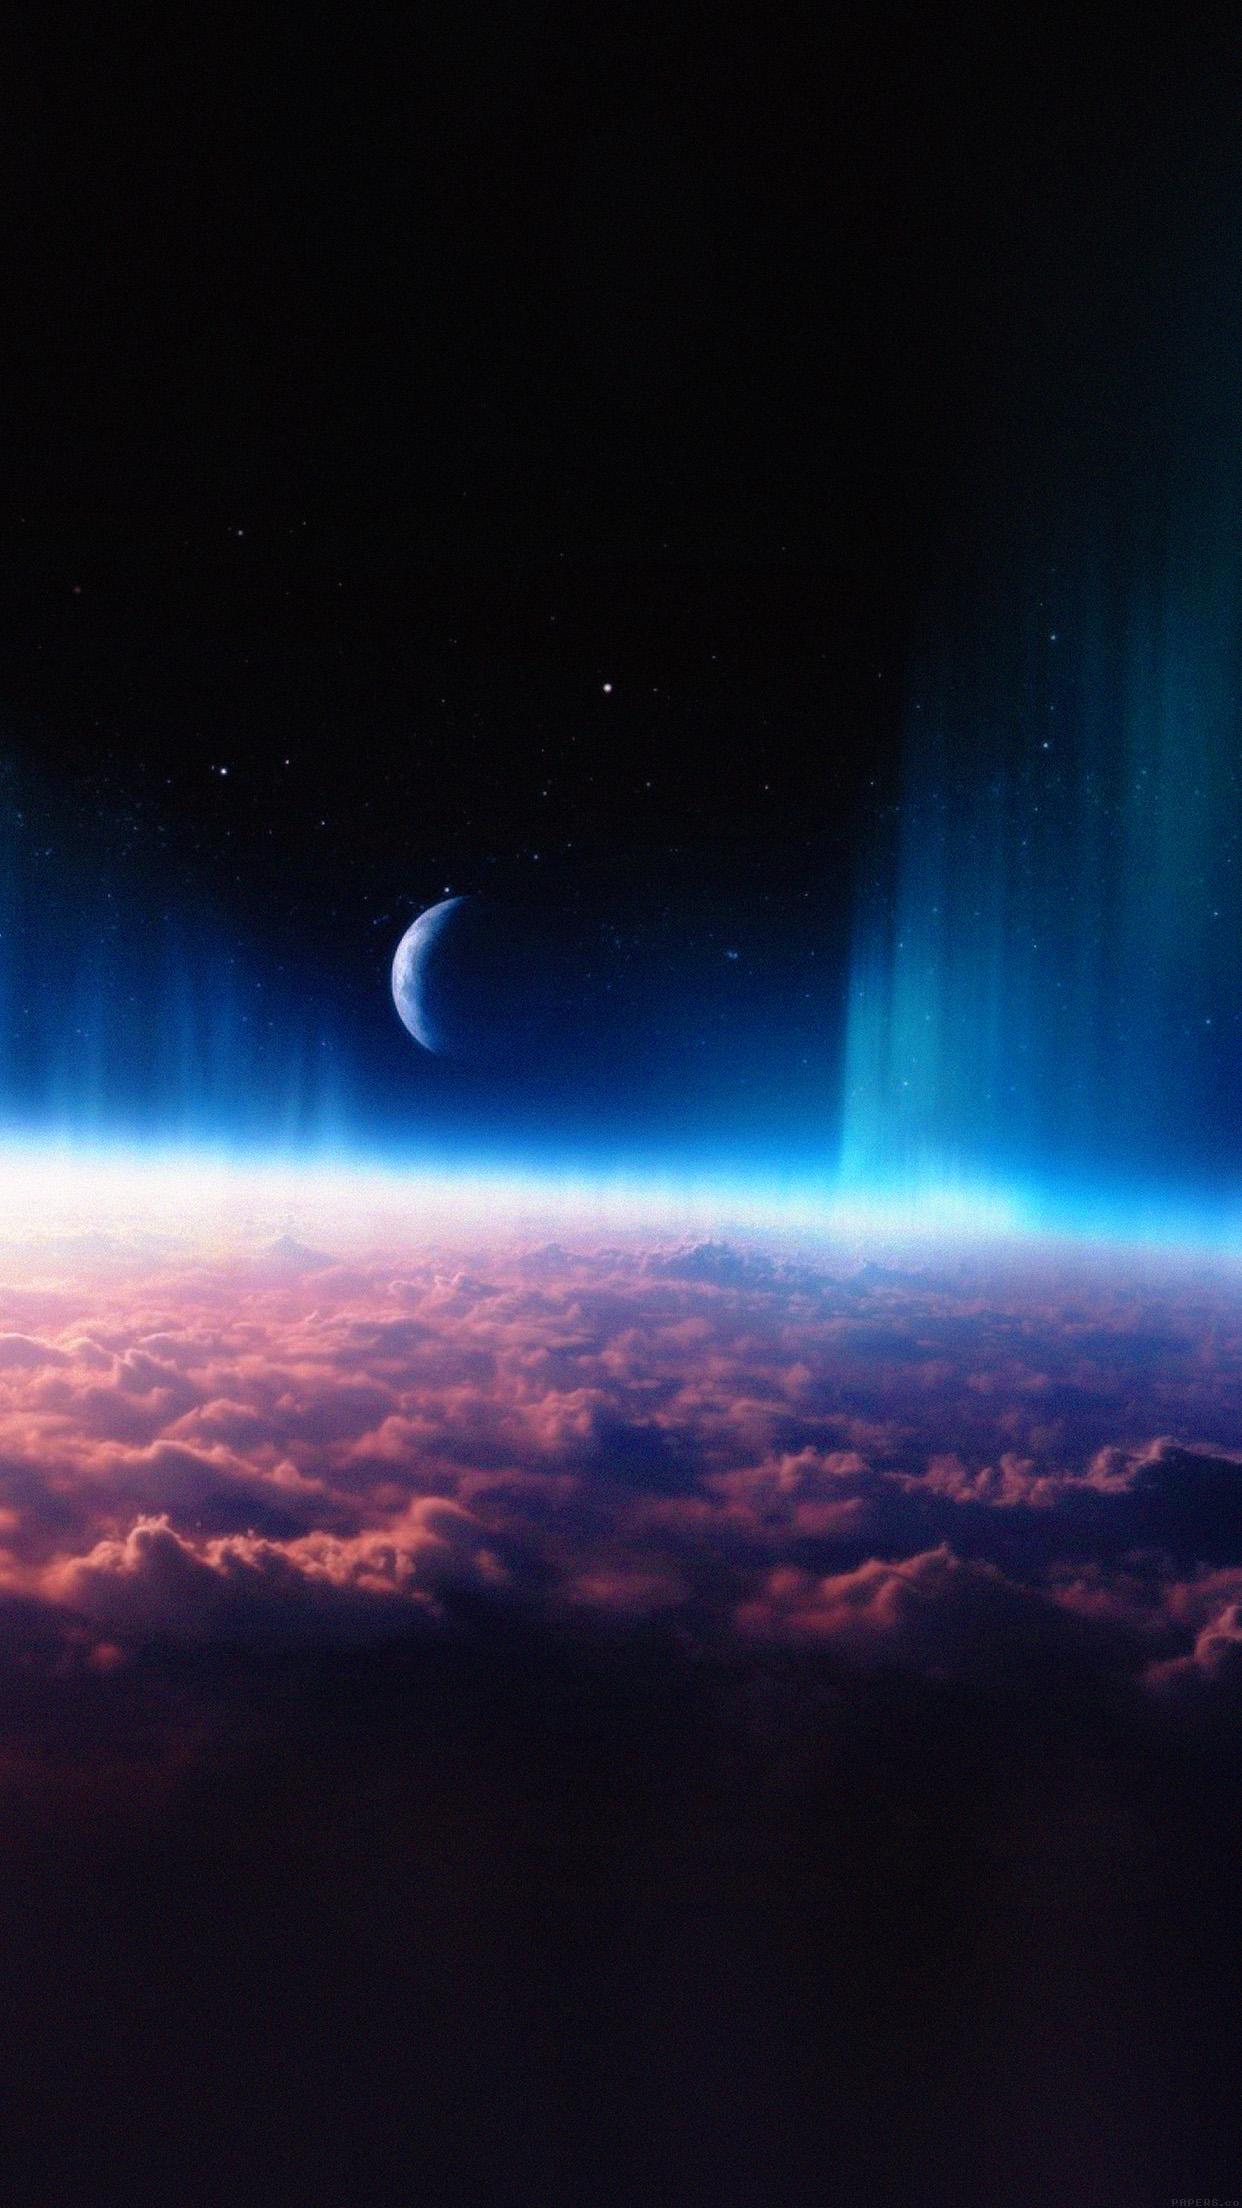 Iphone6papers Mj70 Space Interstellar Sky Free Cloud Nature